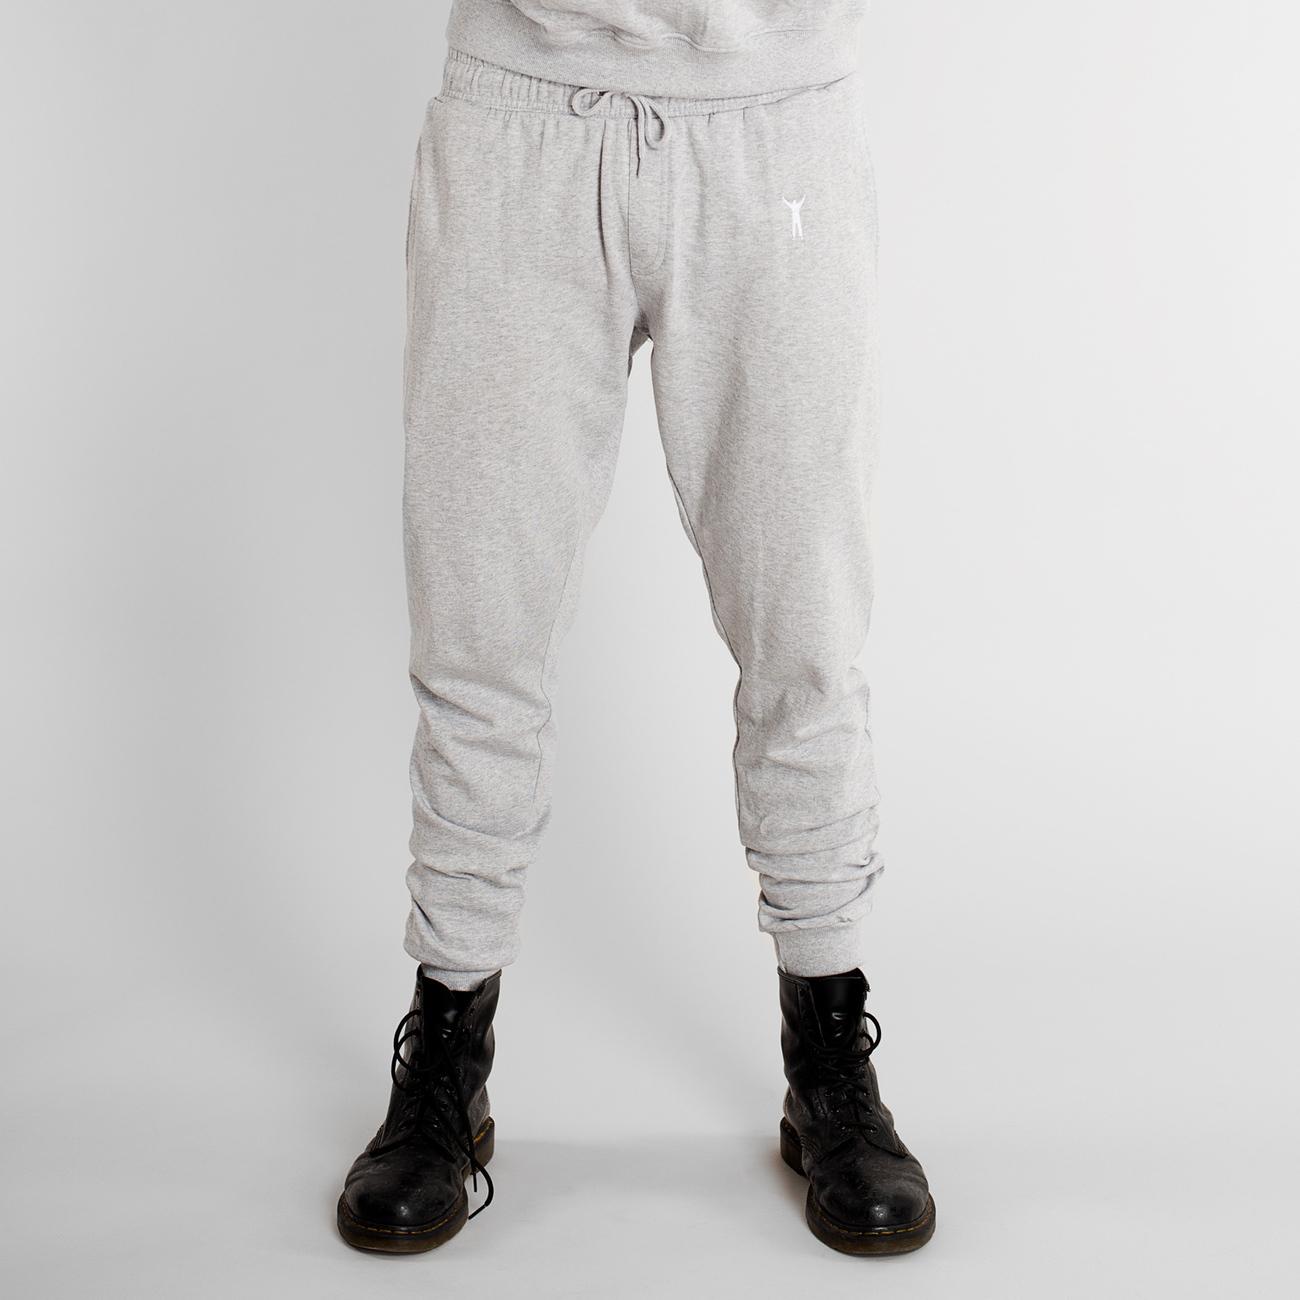 DEDICATED Joggers Lund Rocky Pose Grey Melange